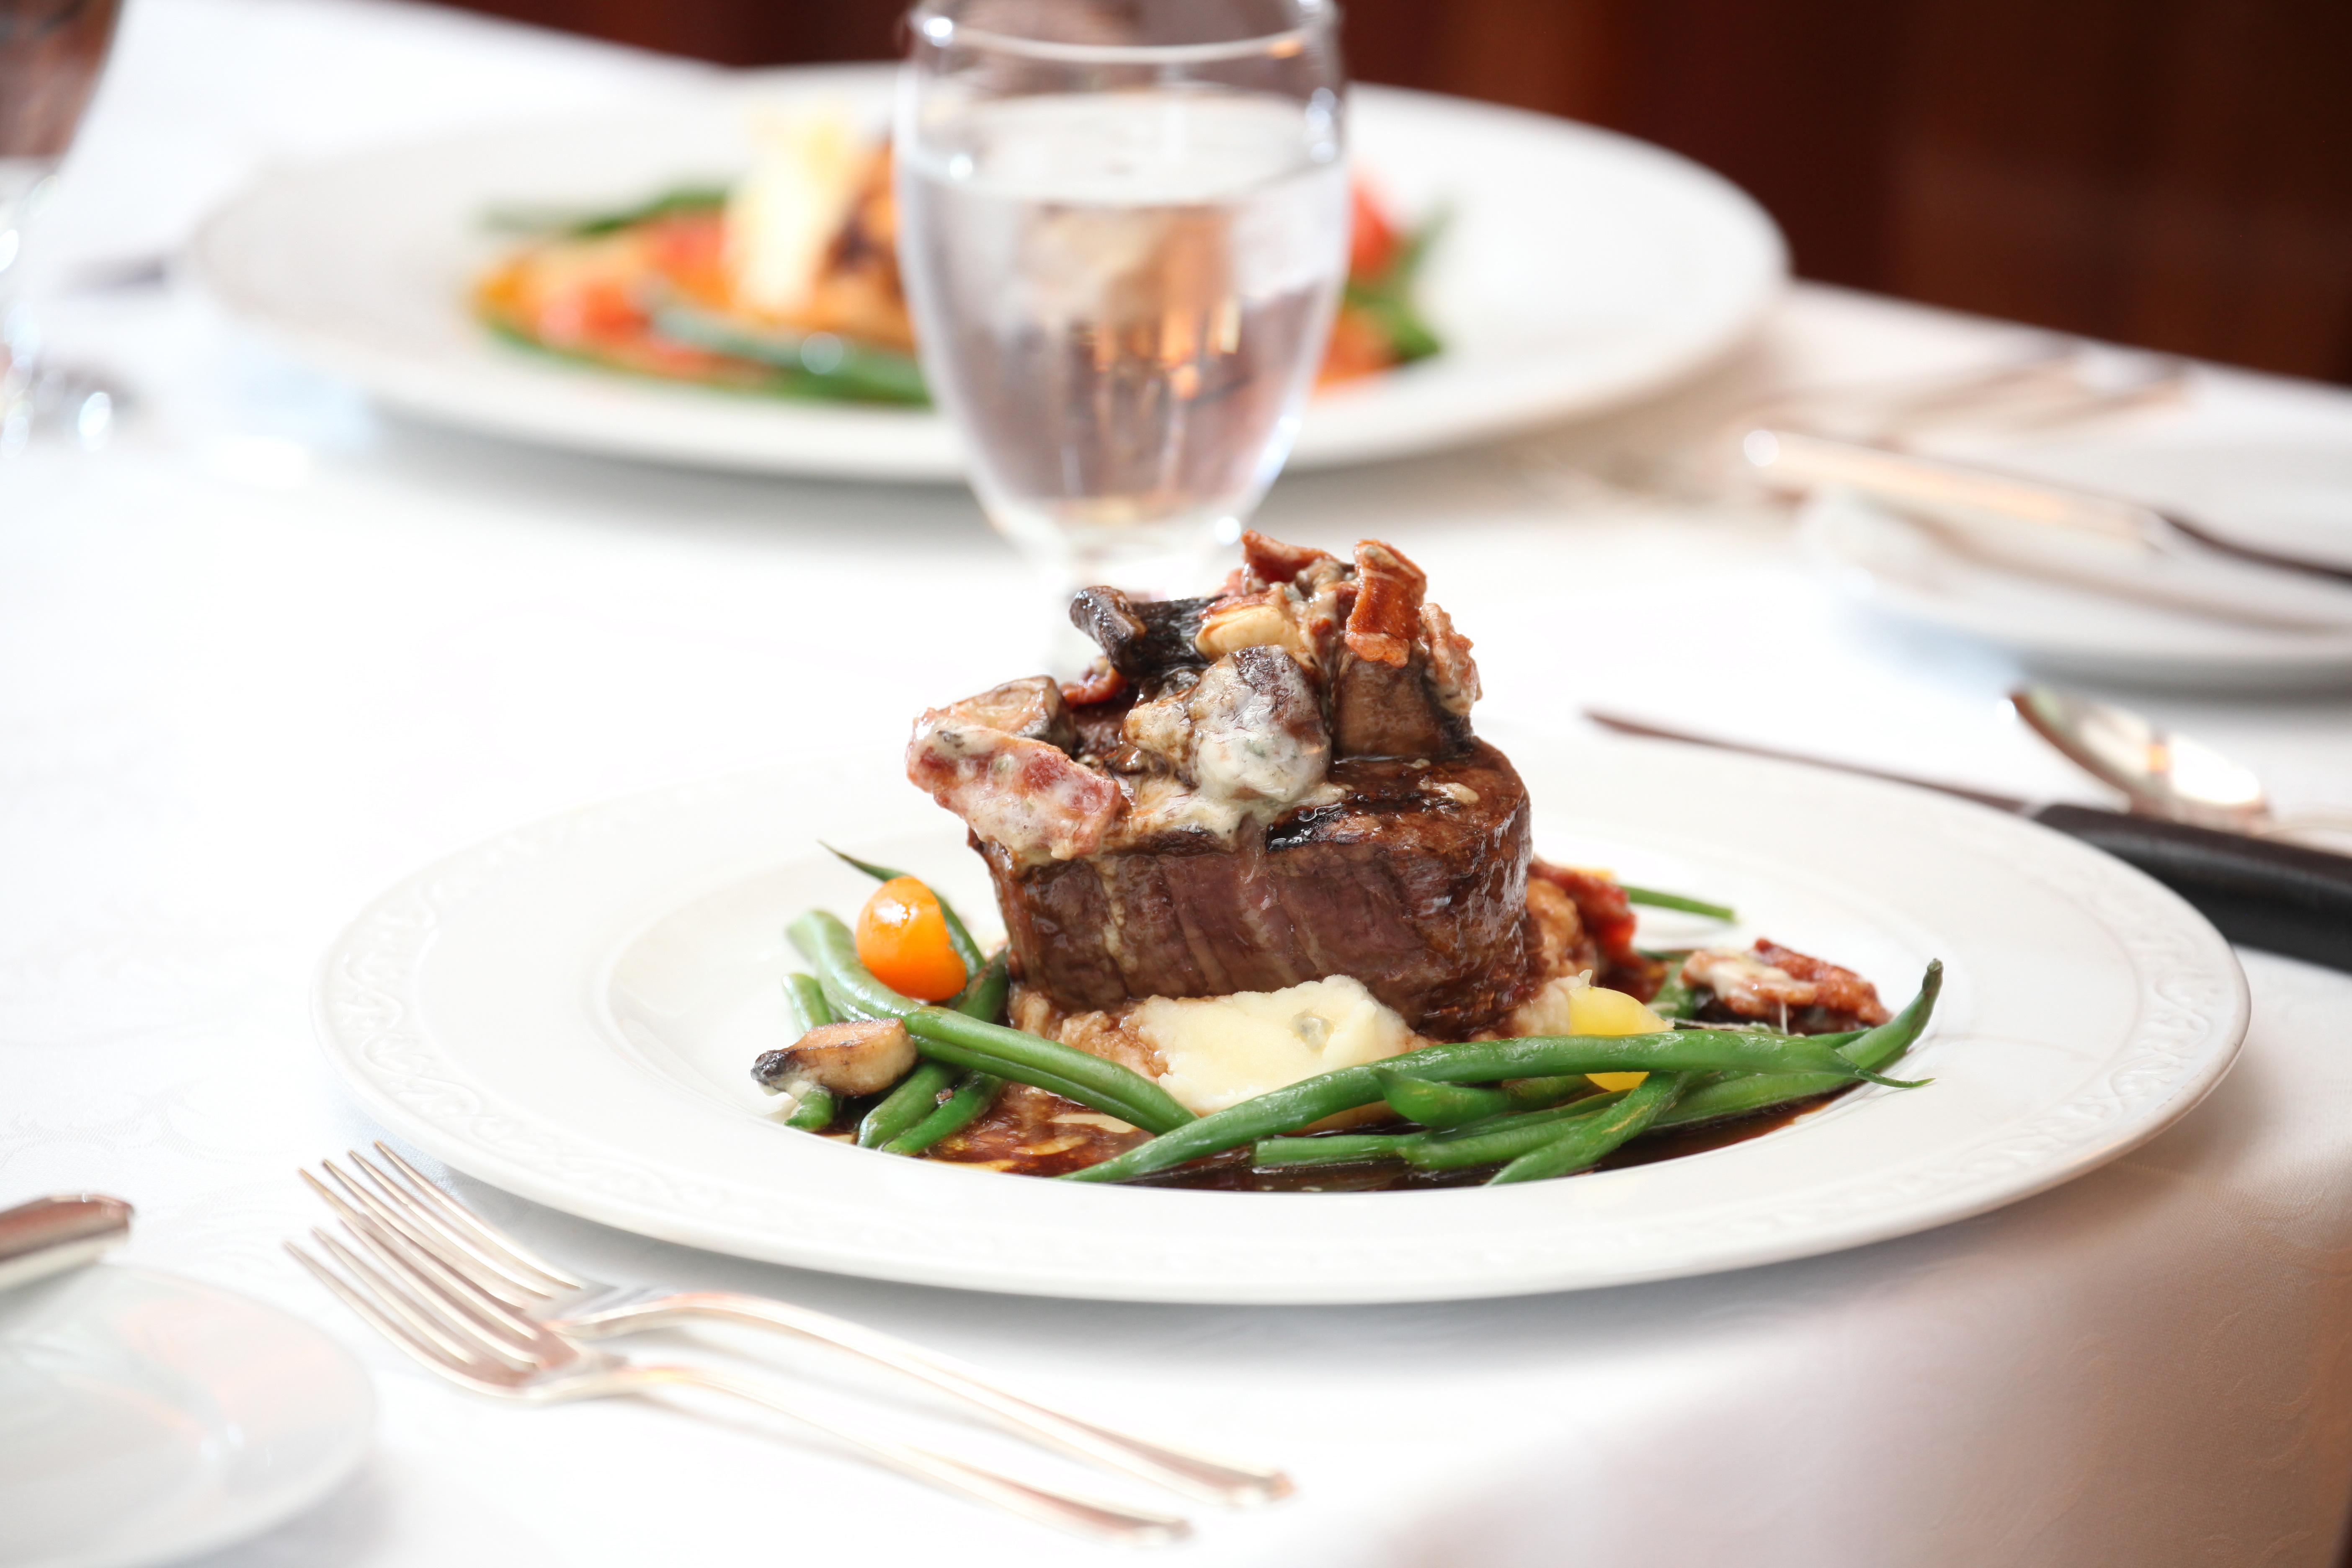 Char-Grilled Filet of Beef offered at Mercerburg